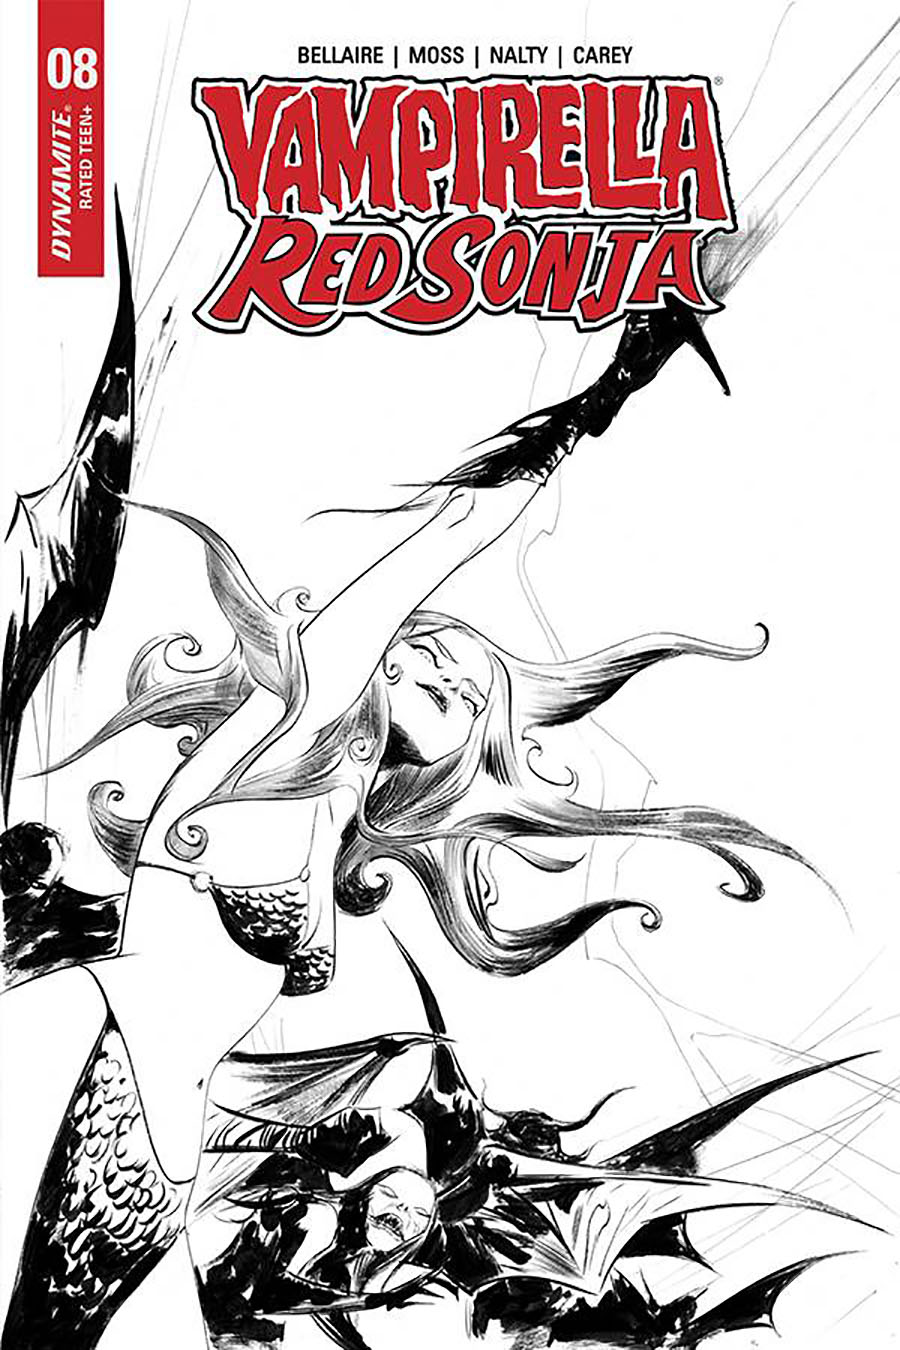 Vampirella Red Sonja #8 Cover N Incentive Jae Lee Black & White Cover